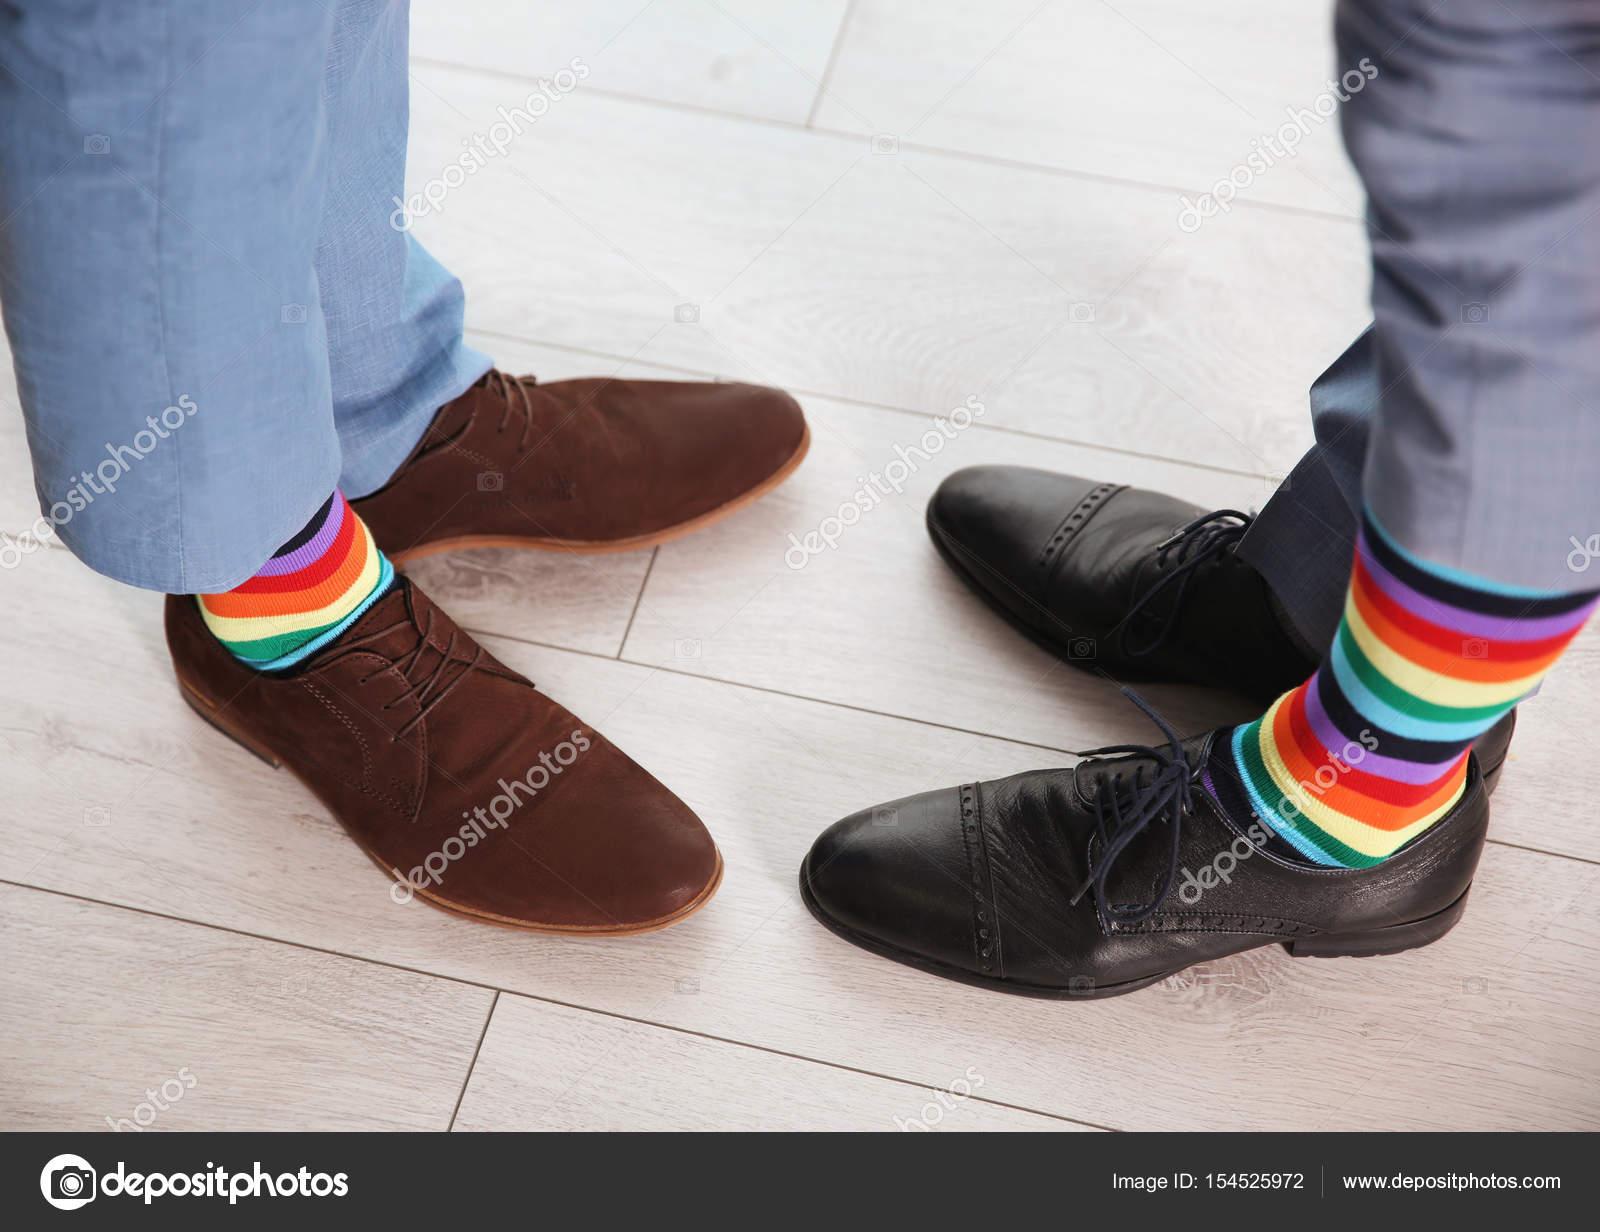 calcetos gay